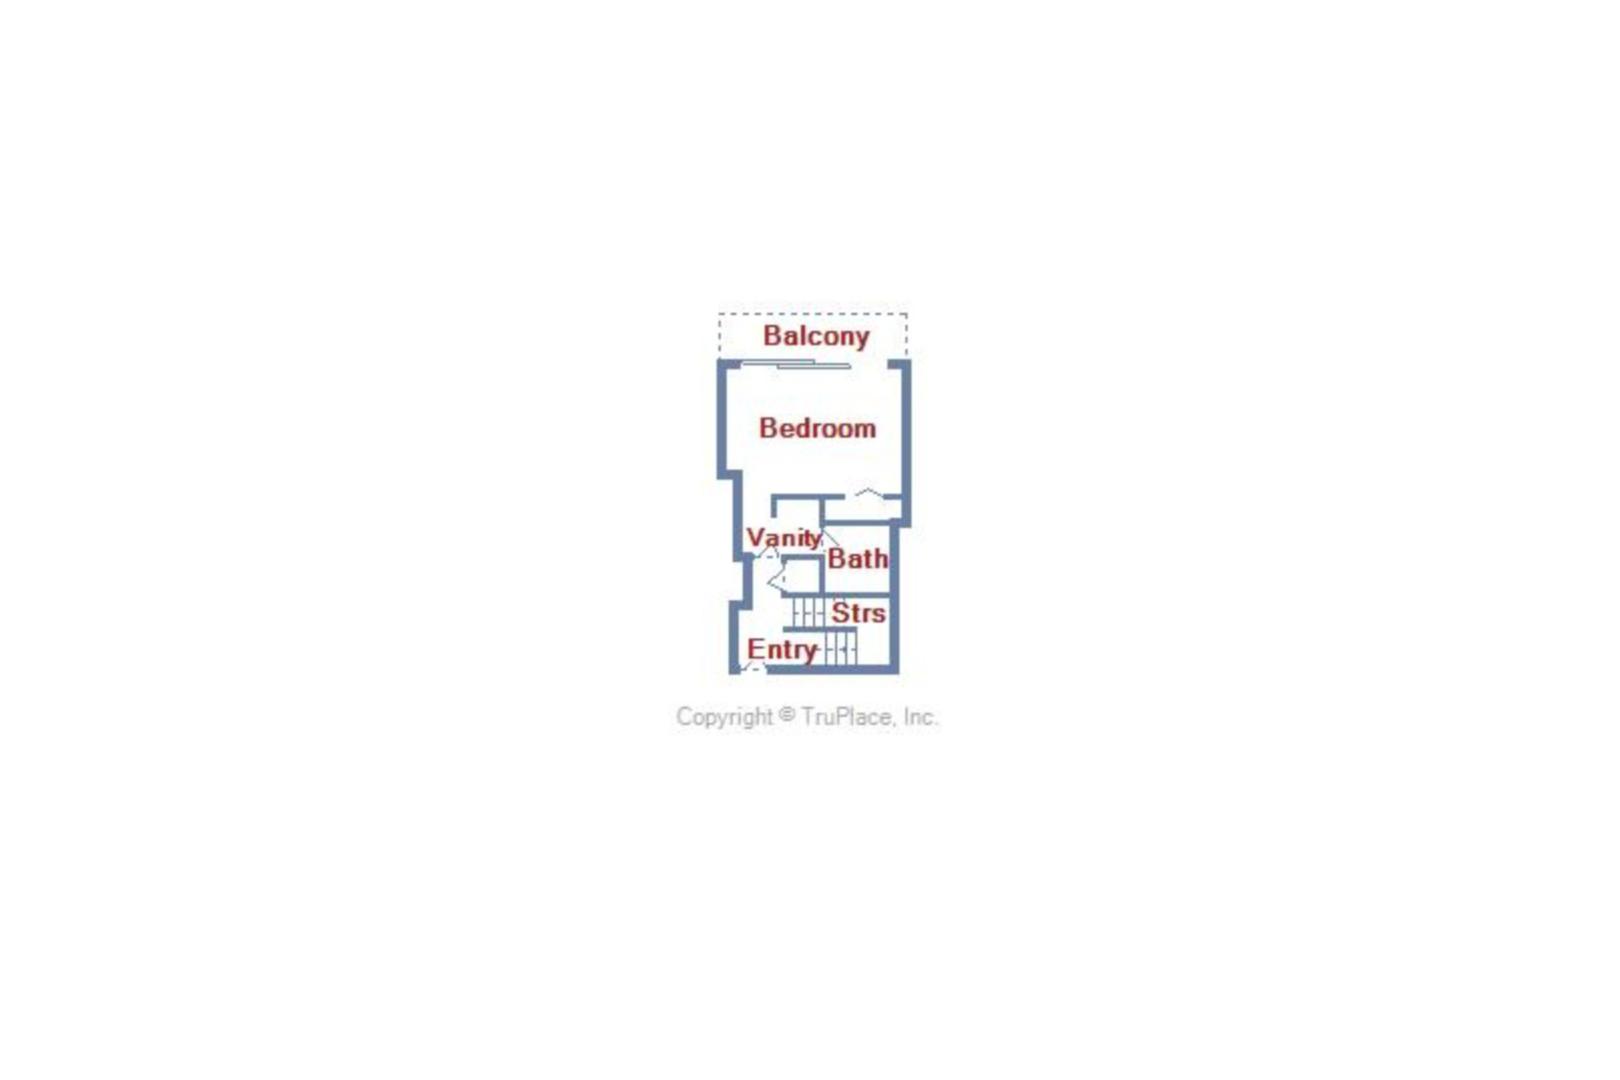 Century I 719 - Lower Level Floor Plan